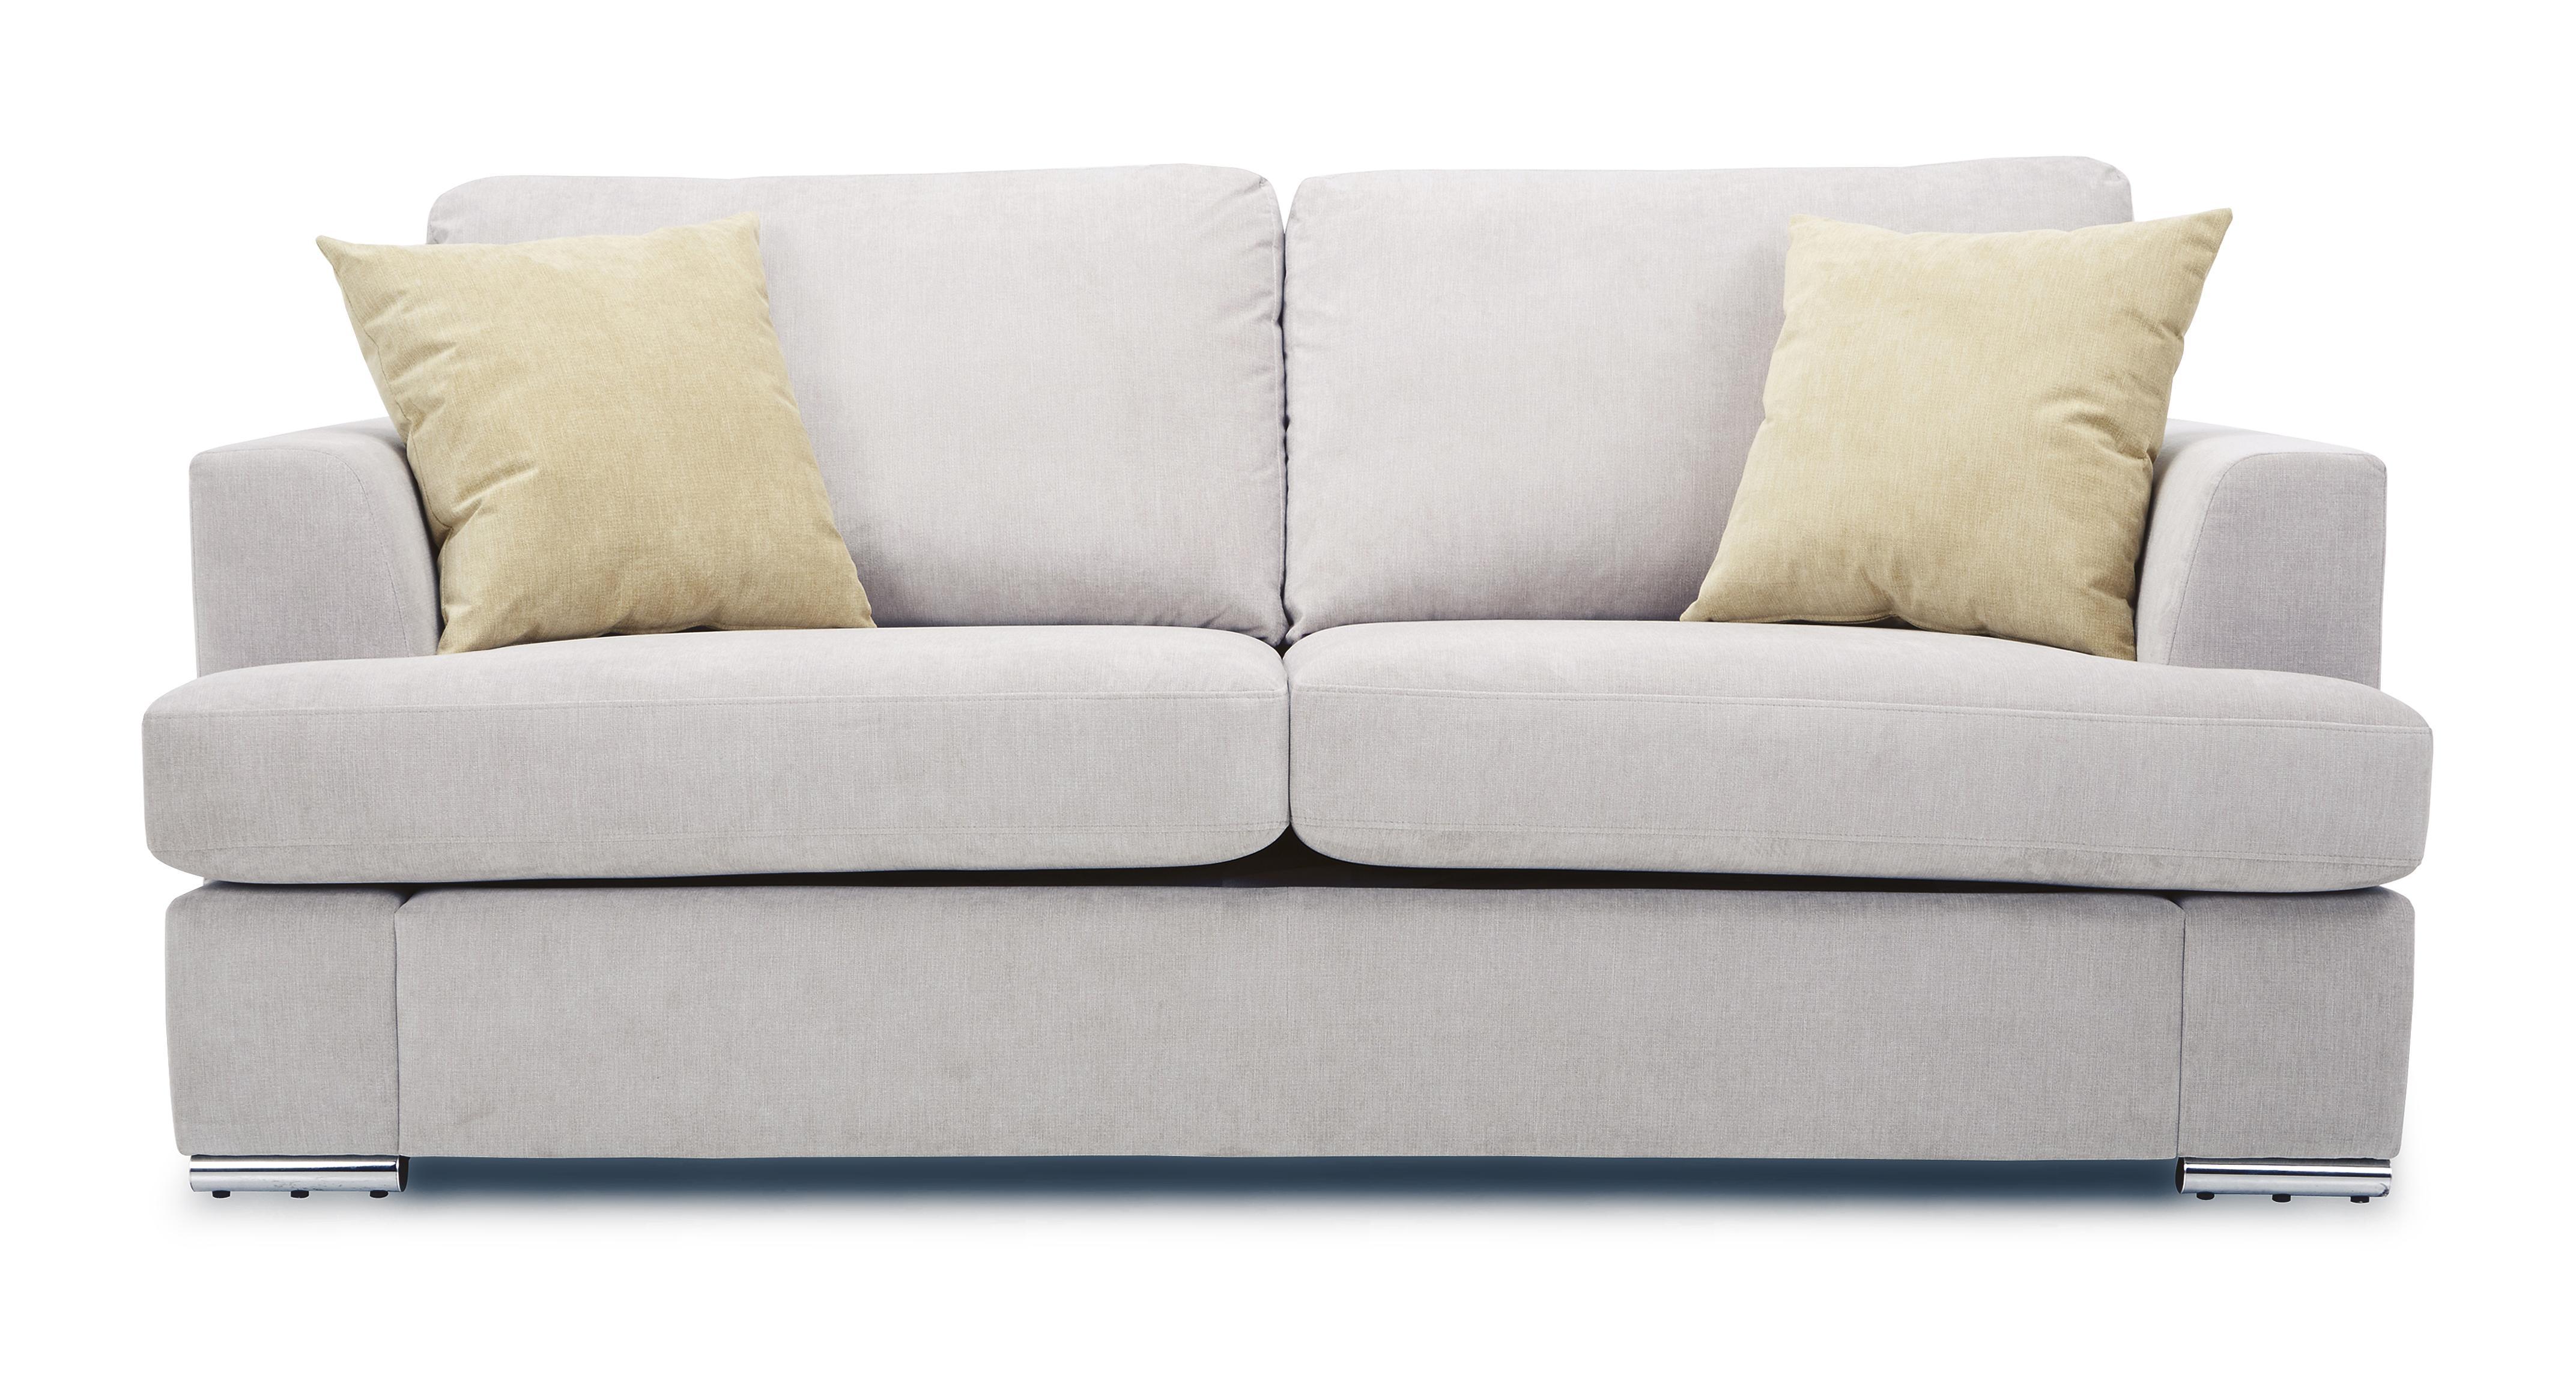 Awe Inspiring Freya 3 Seater Deluxe Sofa Bed Machost Co Dining Chair Design Ideas Machostcouk